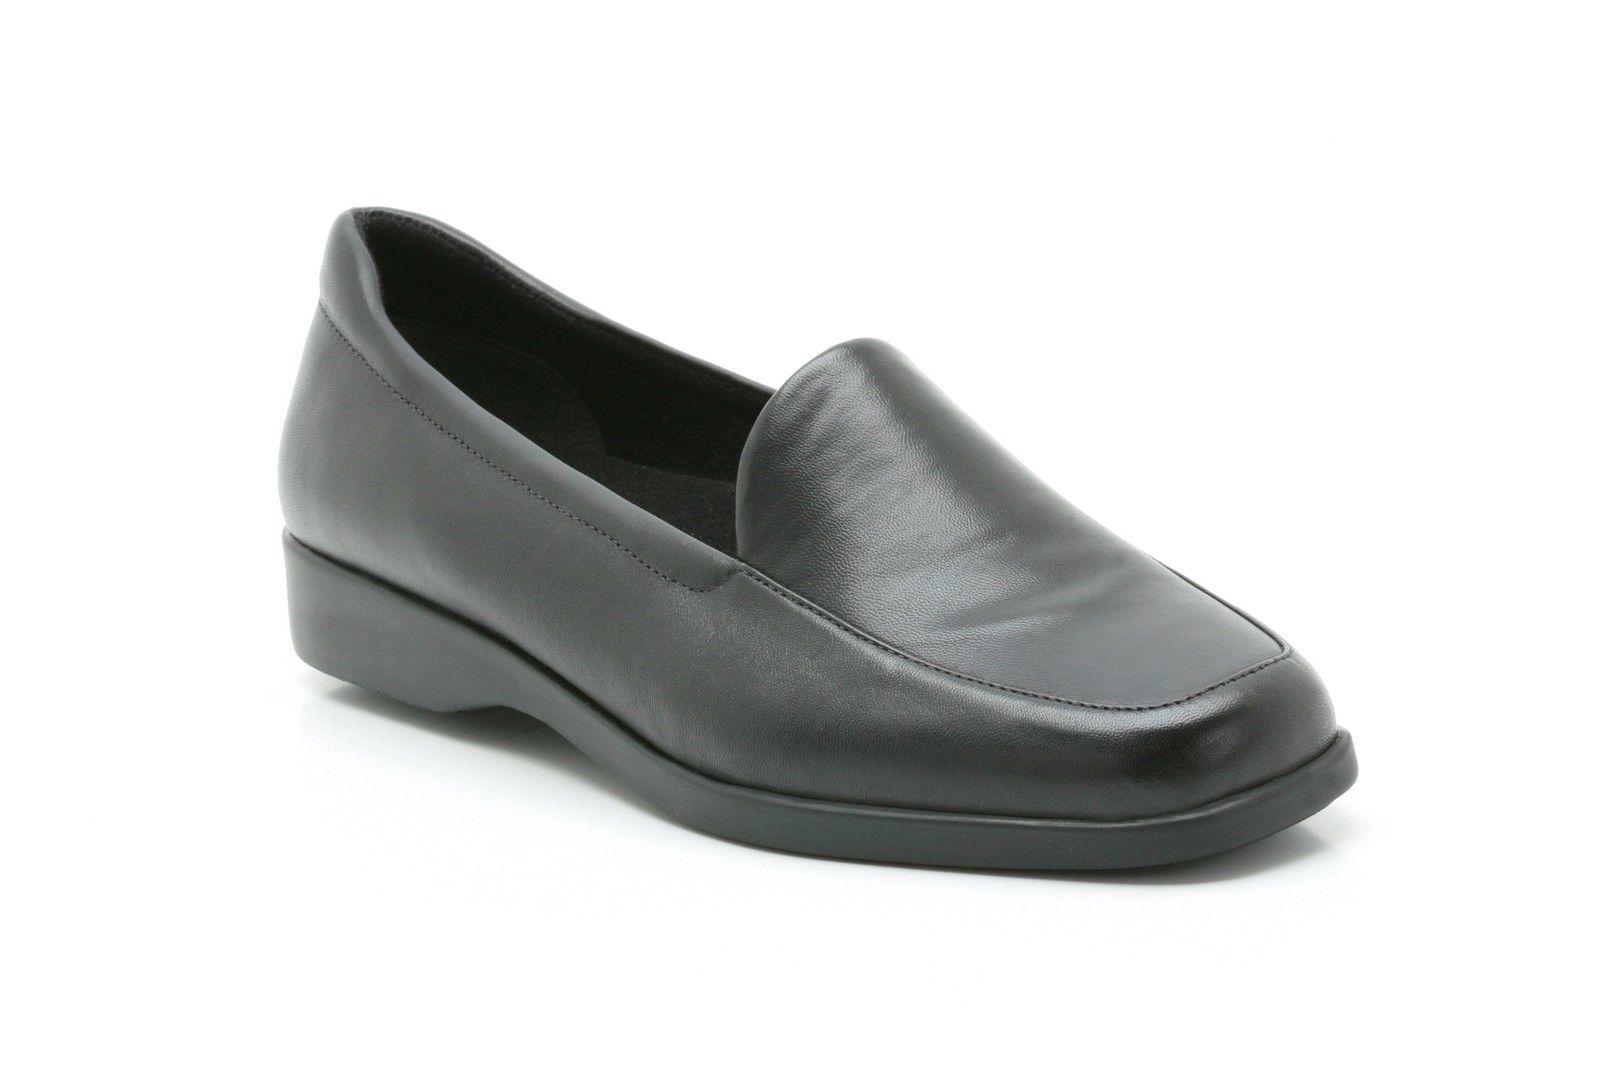 Ladies Black Clarks Shoes Slip On